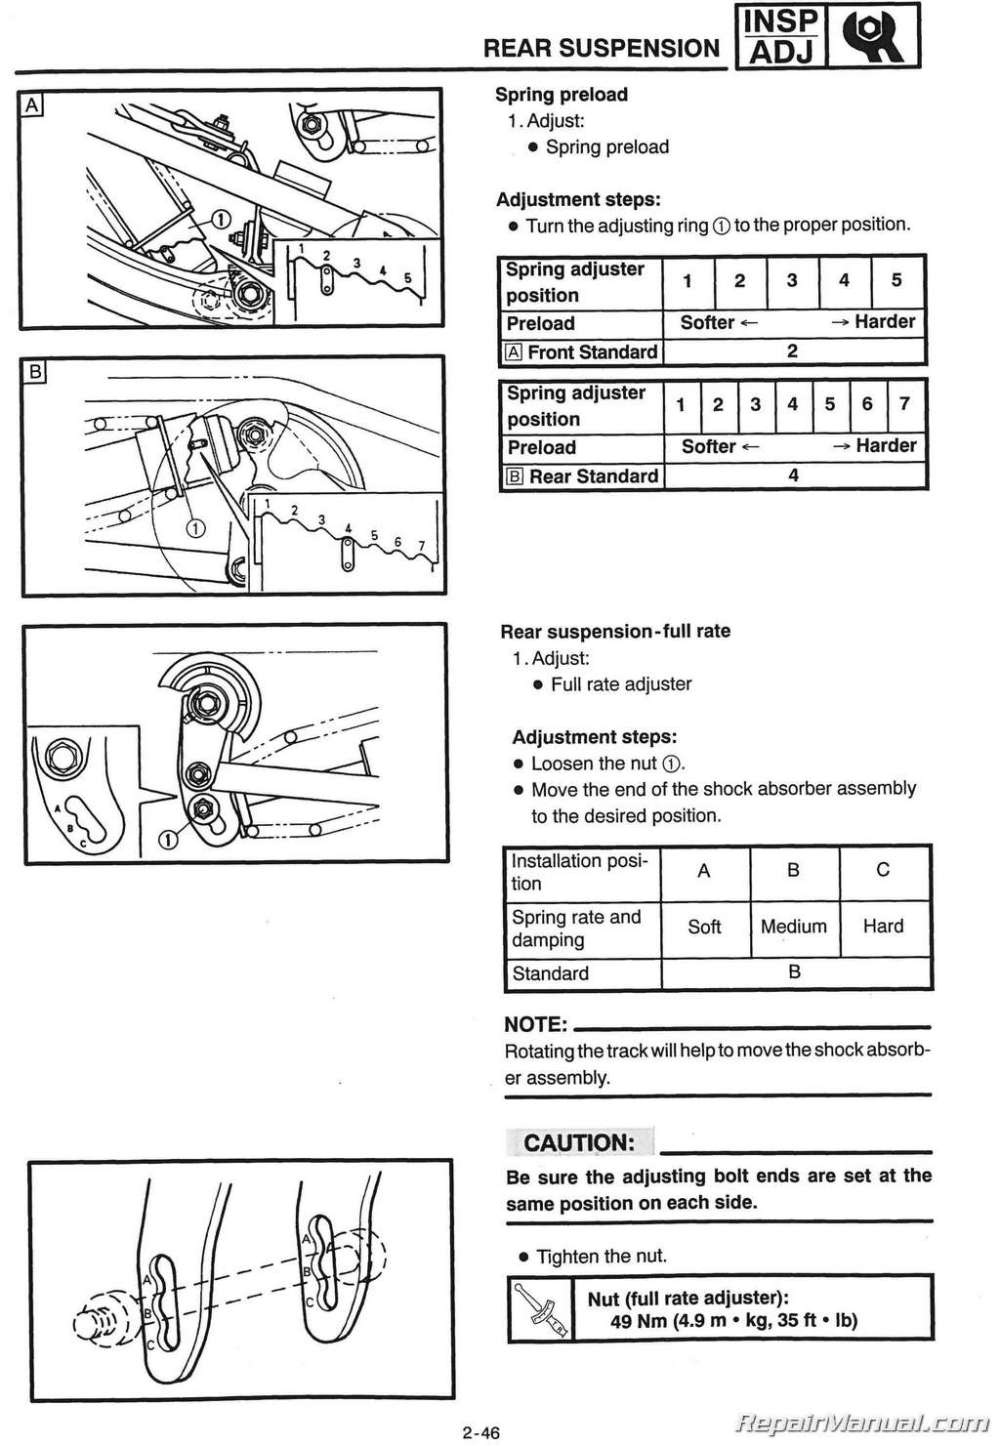 medium resolution of 1997 yamaha snowmobile wiring diagram trusted wiring diagram vmax 540 snowmobile wiring diagram yamaha vmax